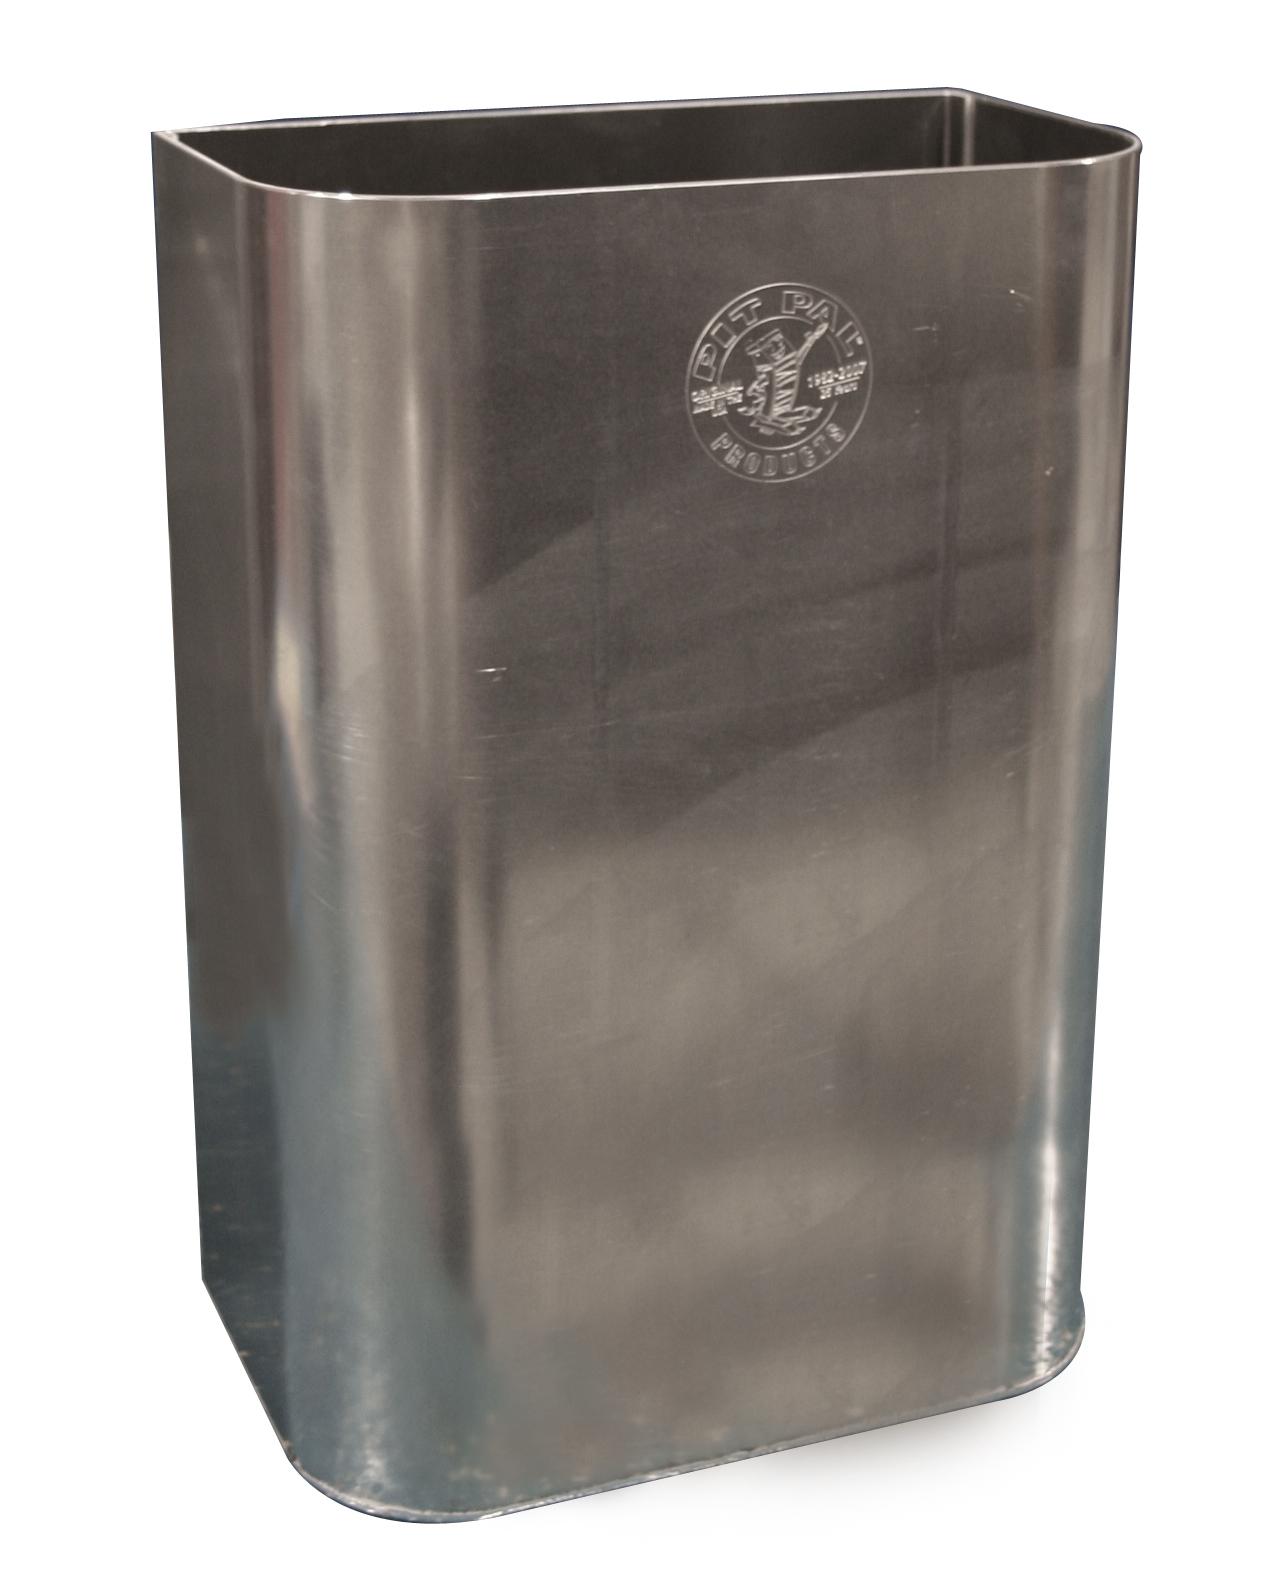 Aluminum Trash Cans : Pit pal aluminum trash can free shipping